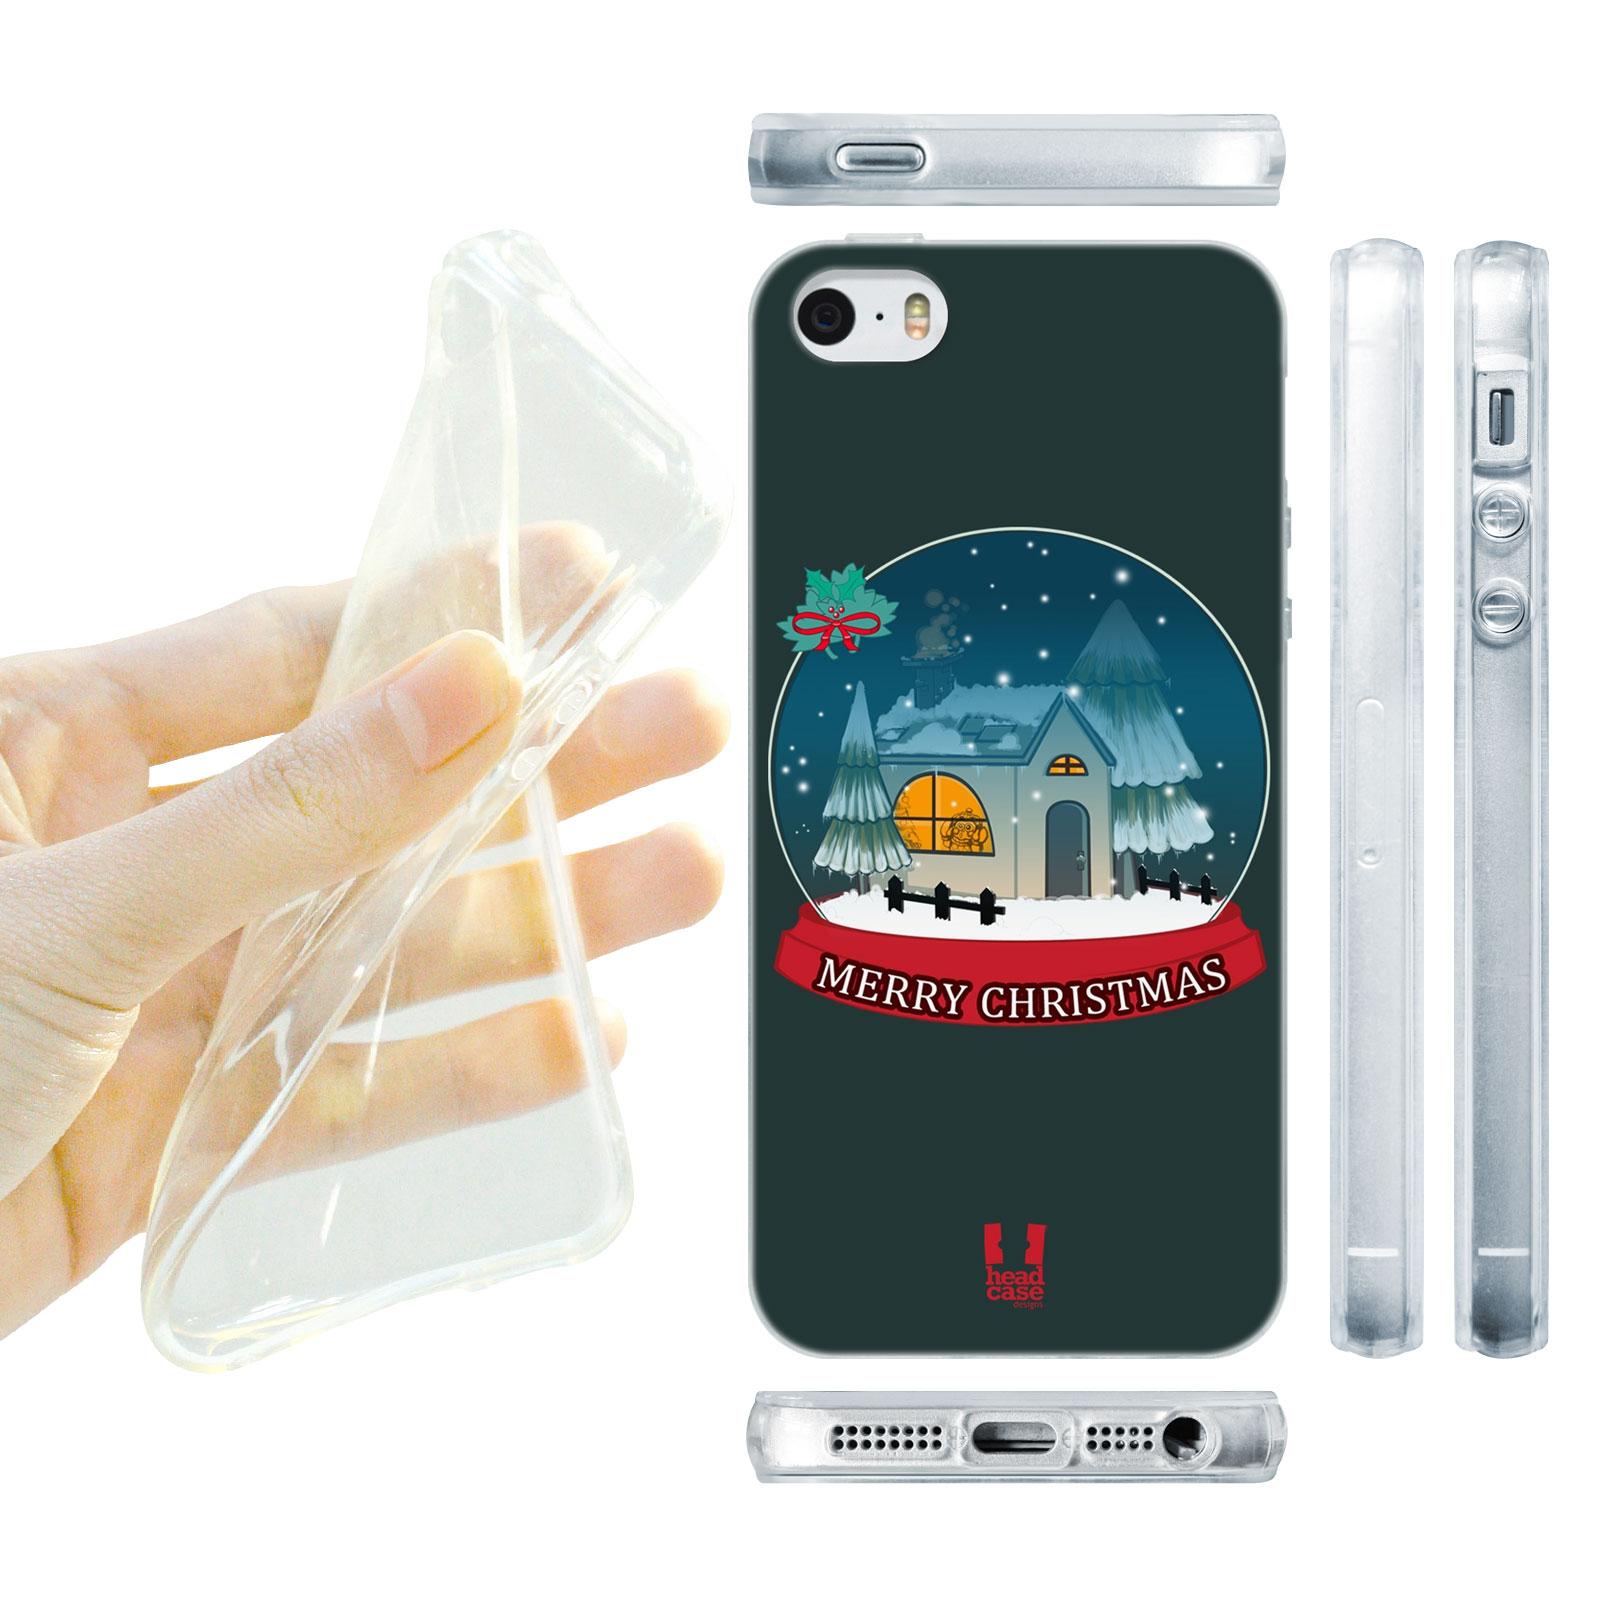 HEAD CASE silikonový obal na mobil Iphone 5/5S Vzor vánoce sněžná koule MERRY CHRISTMASS